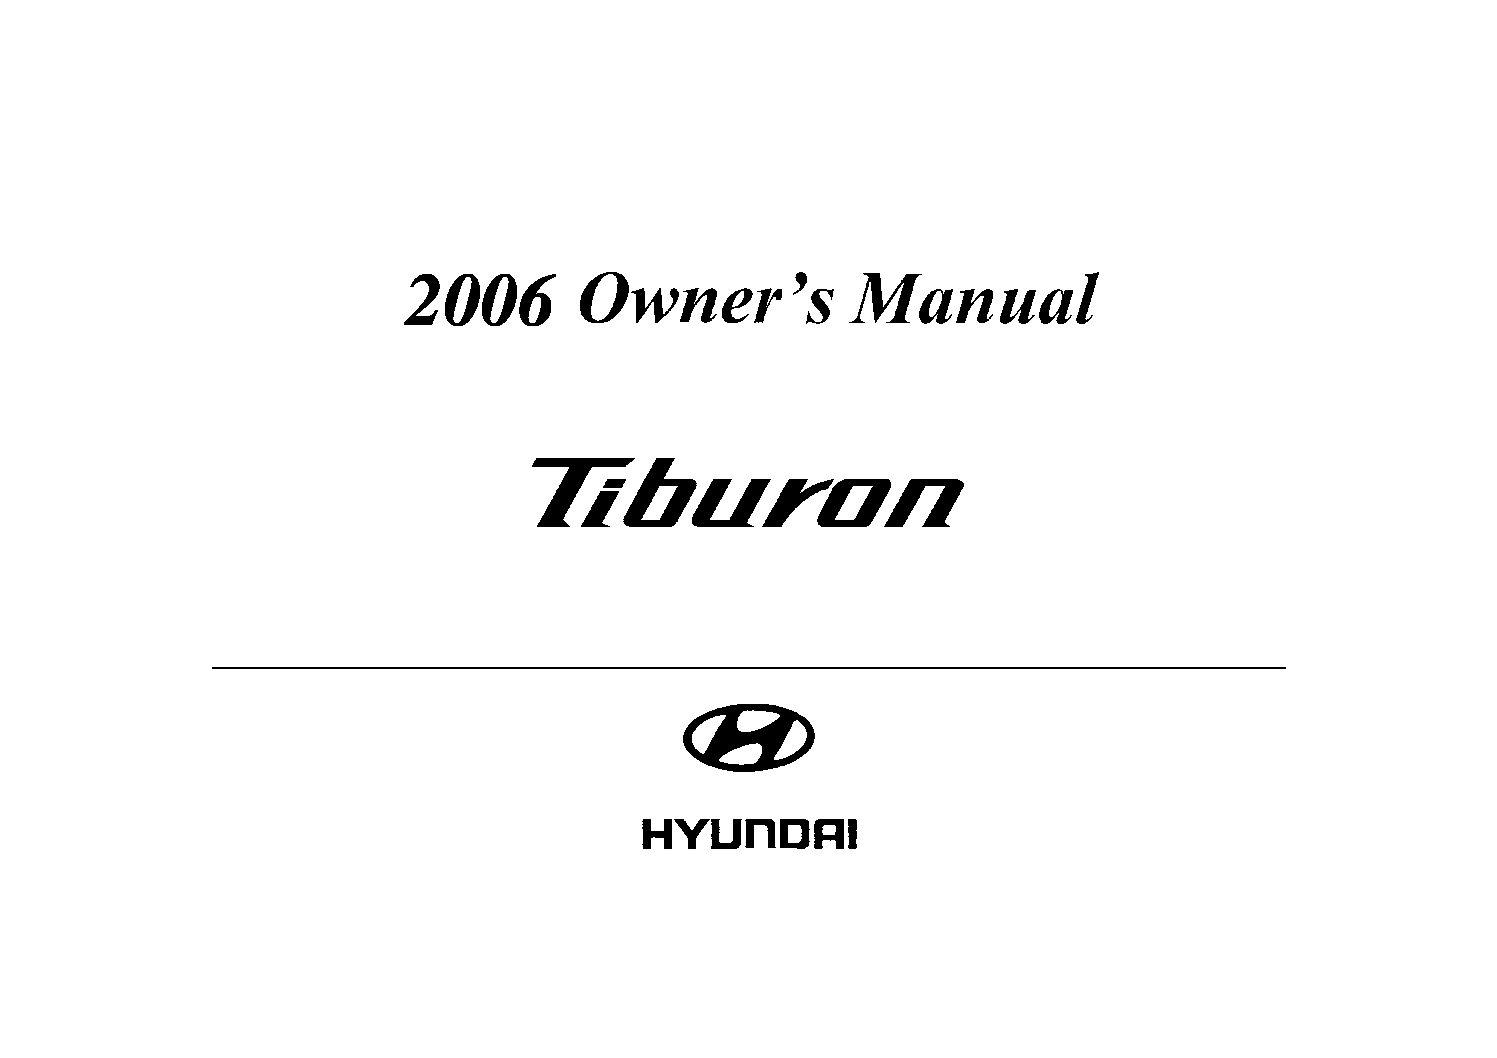 2006 hyundai tiburon owners manual just give me the damn manual rh justgivemethedamnmanual com 1996 Hyundai Tiburon 1995 Hyundai Tiburon